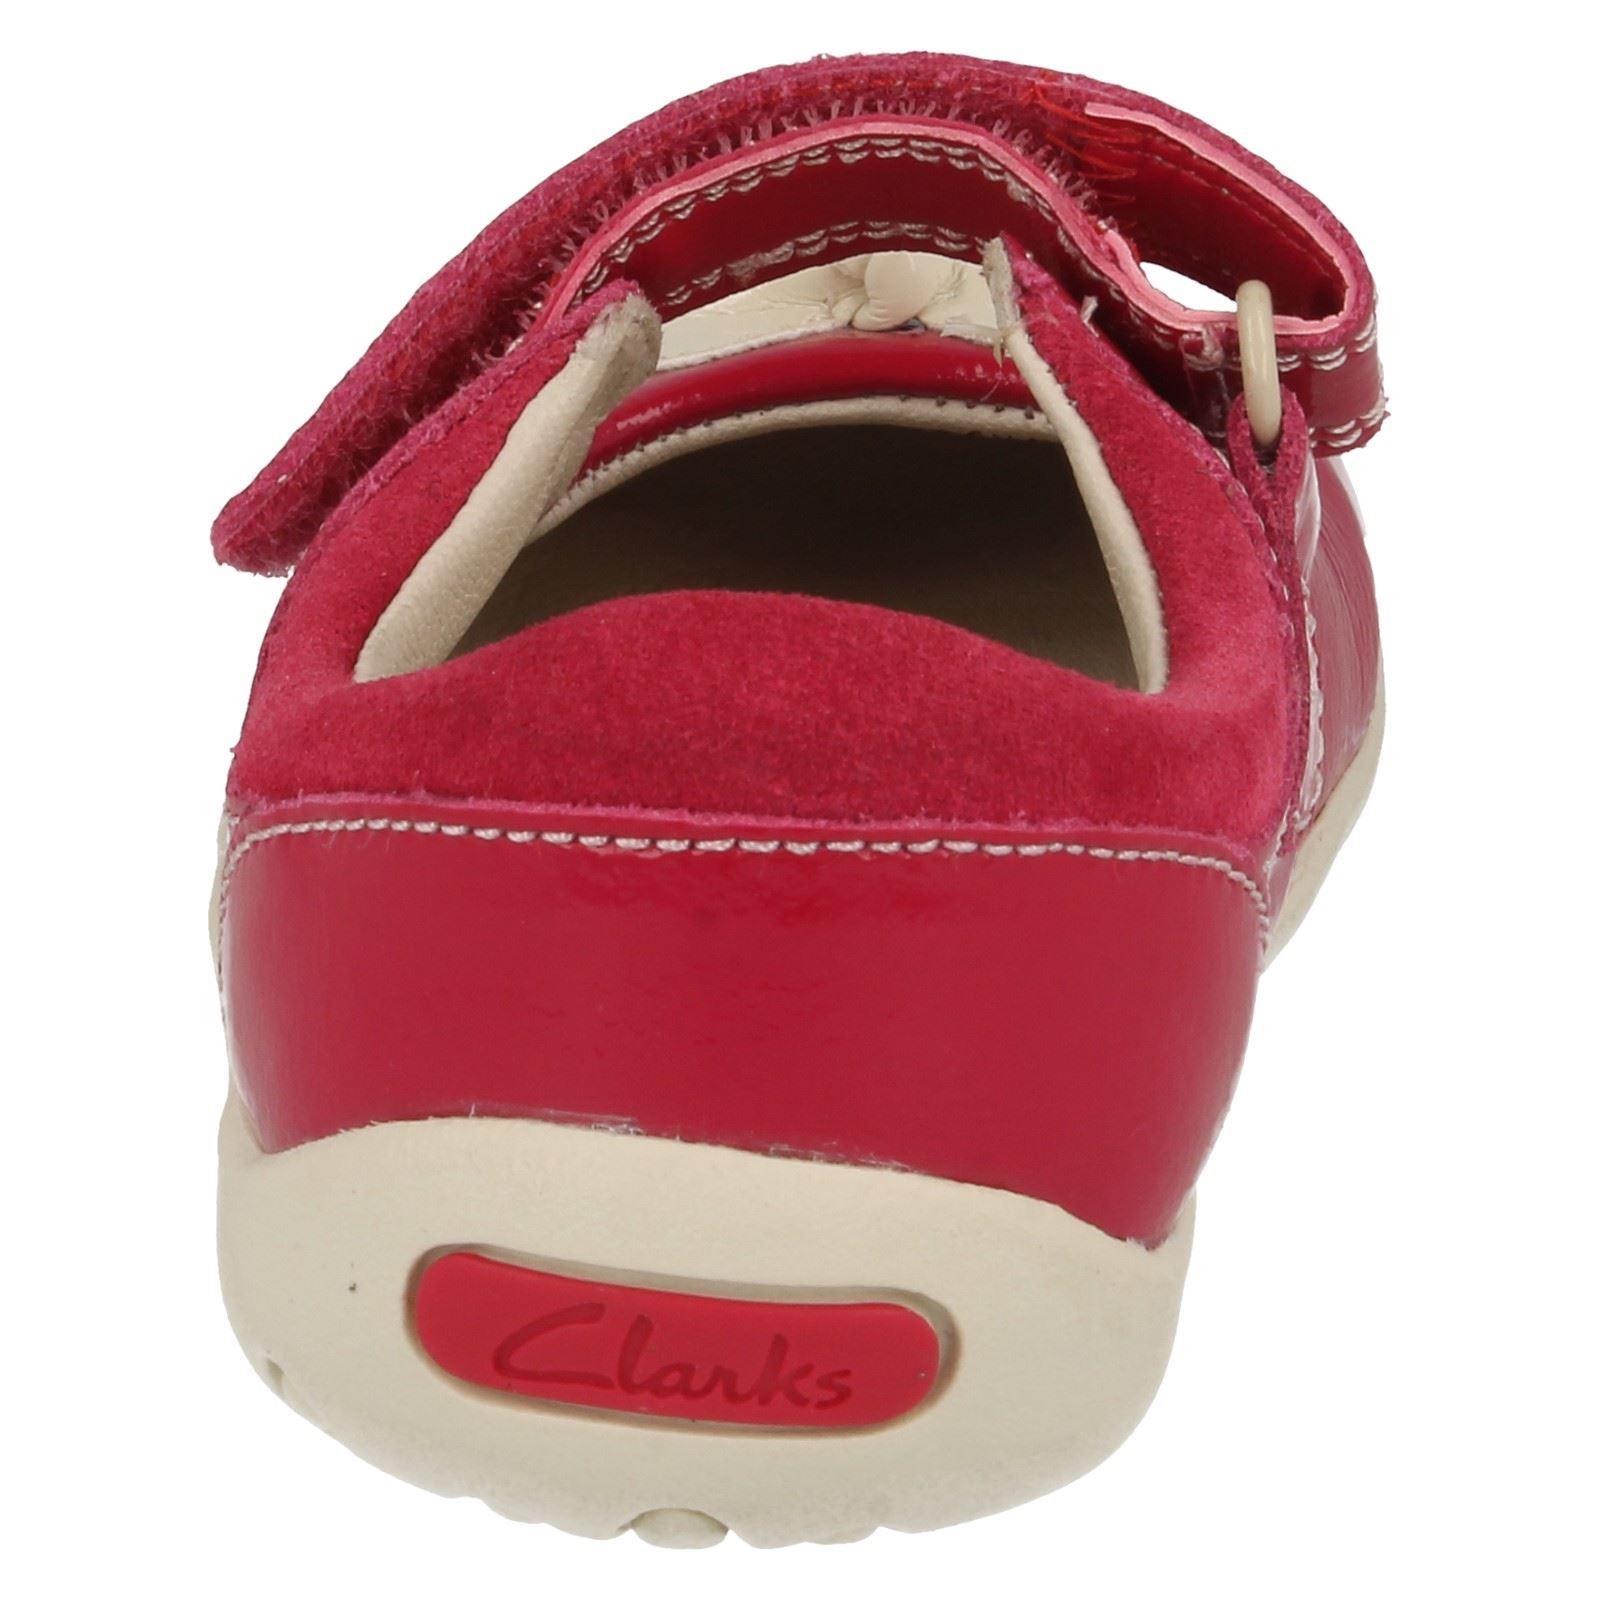 Clarks Clarks niñas diseño Berry rosa con para Zapatos Soft dtAqwdf